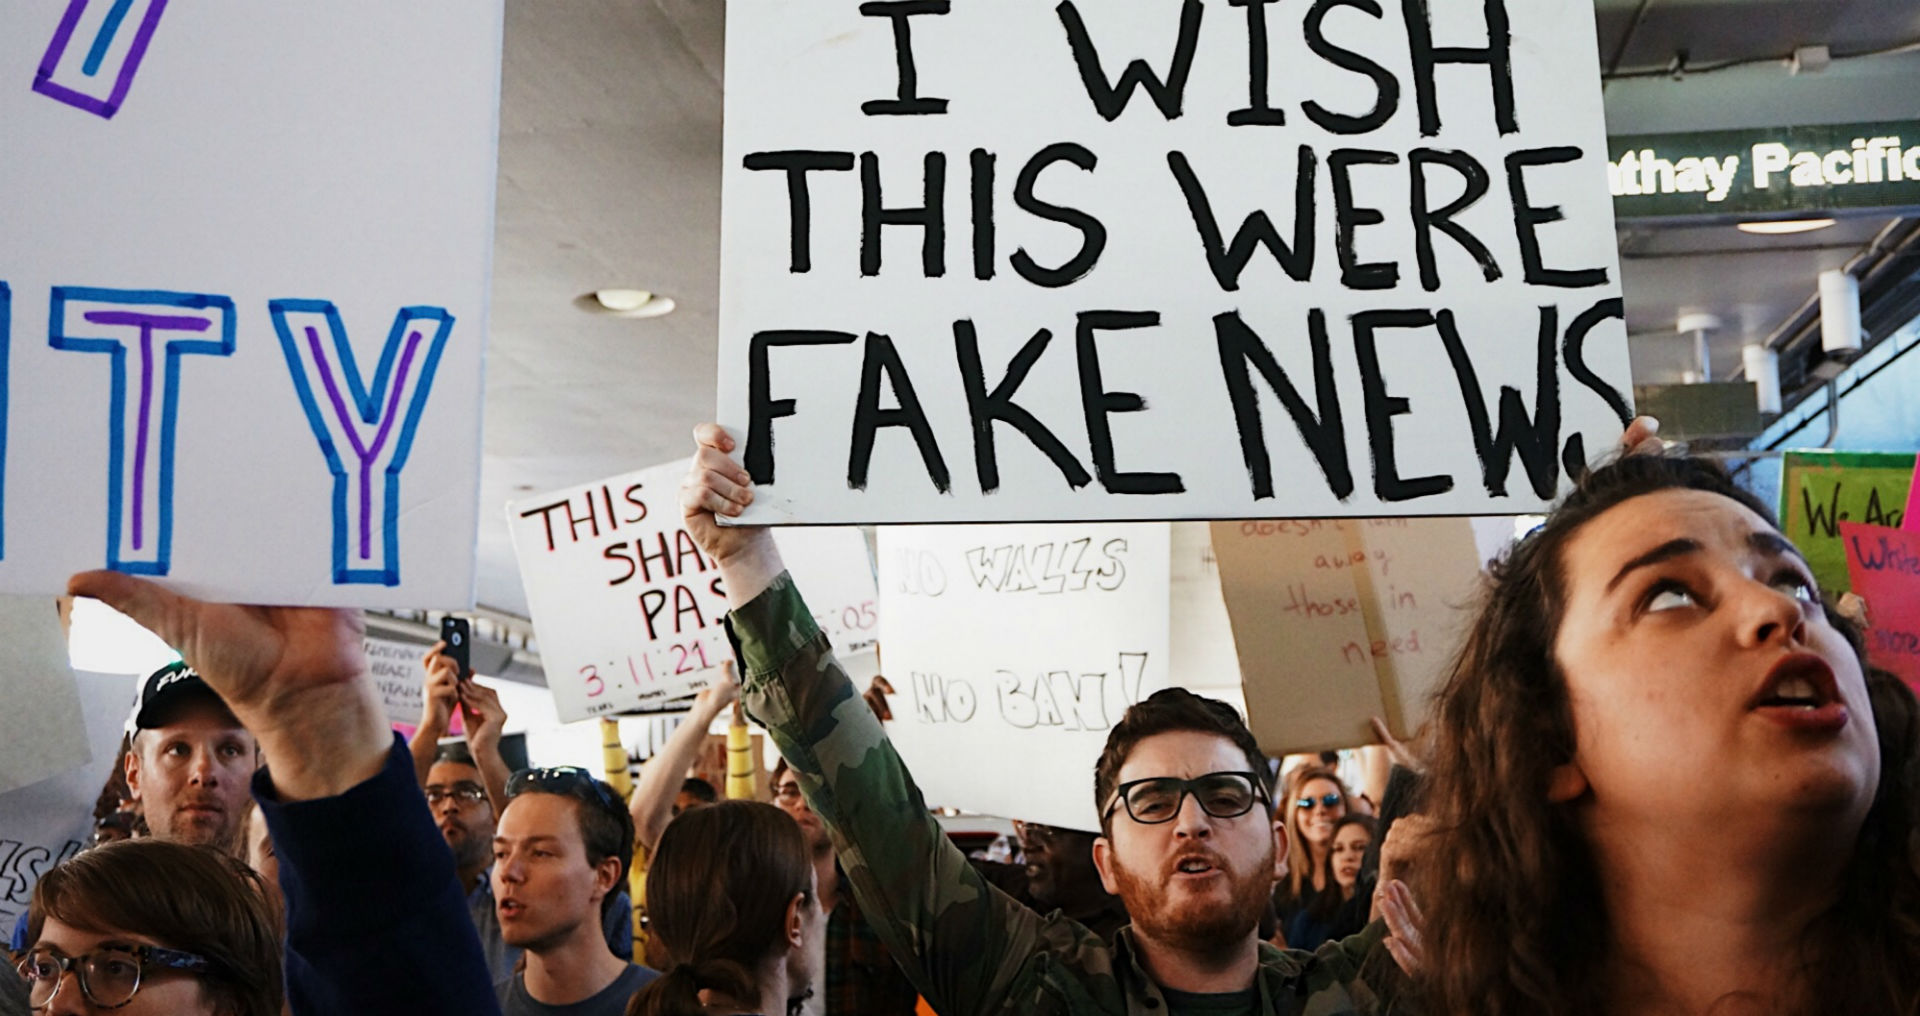 luchar contra las noticias falsas